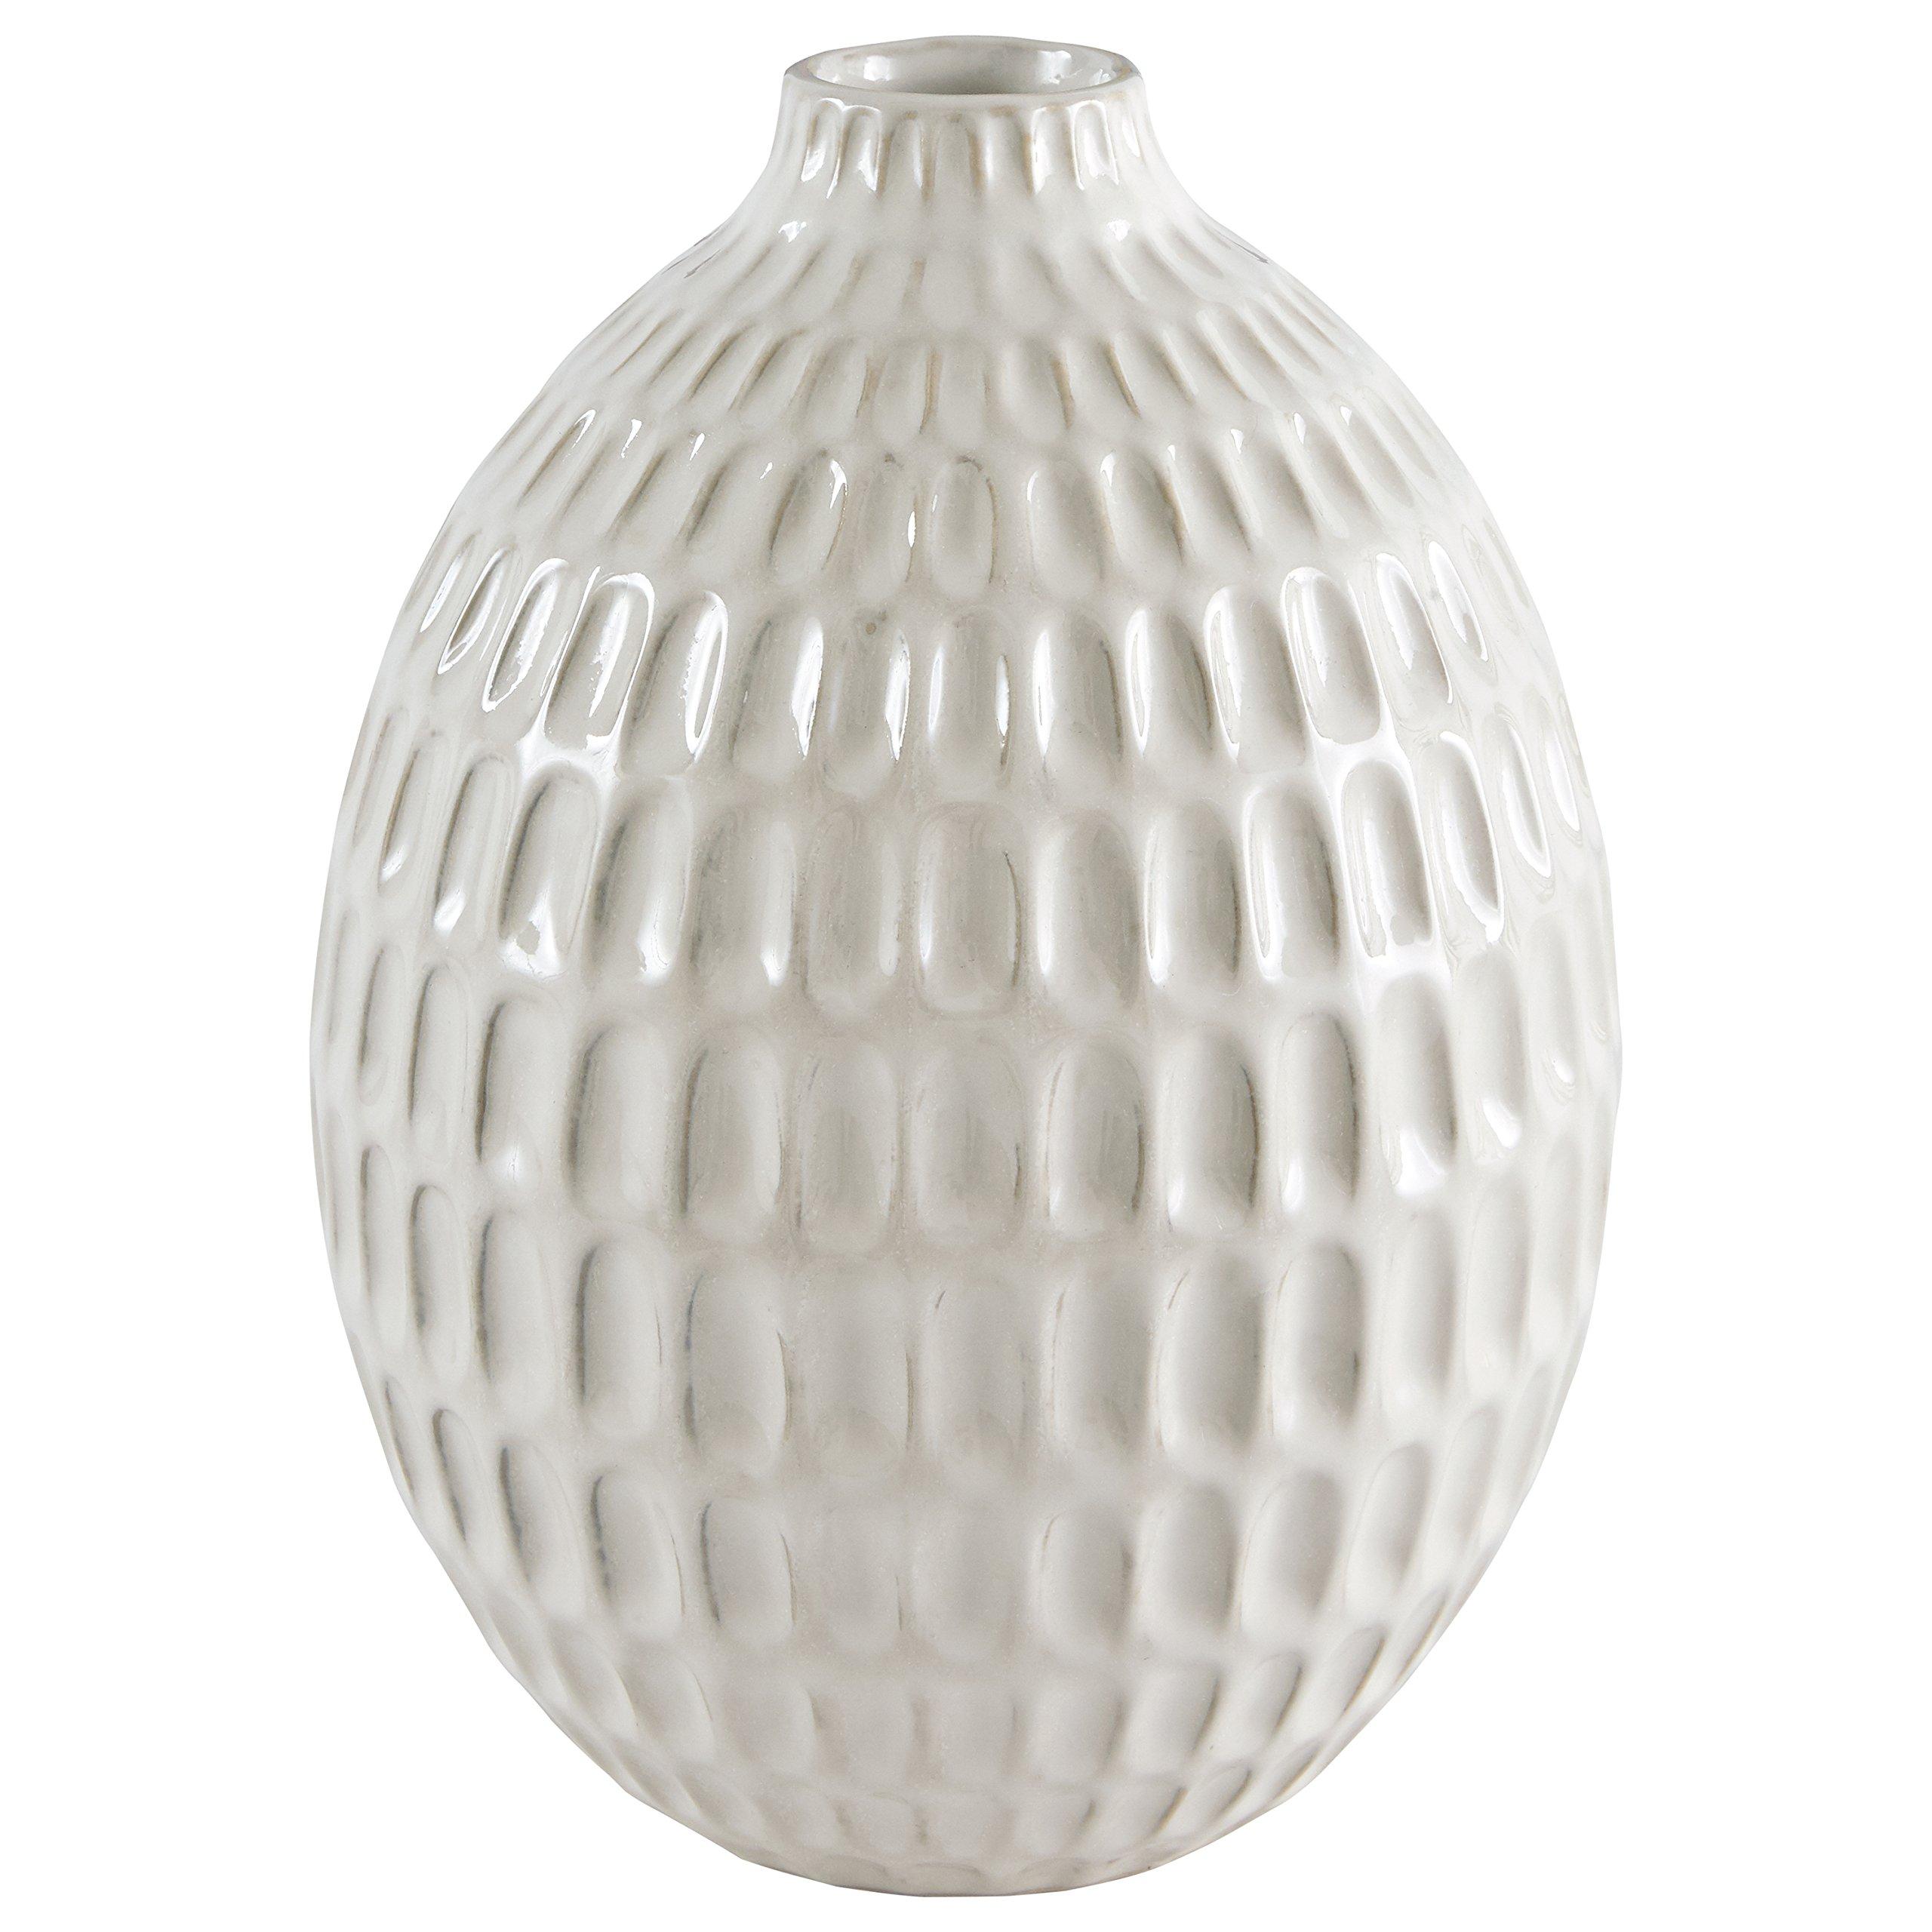 Stone & Beam Modern Oval Pattern Stoneware Vase, 8.75''H, Off-White